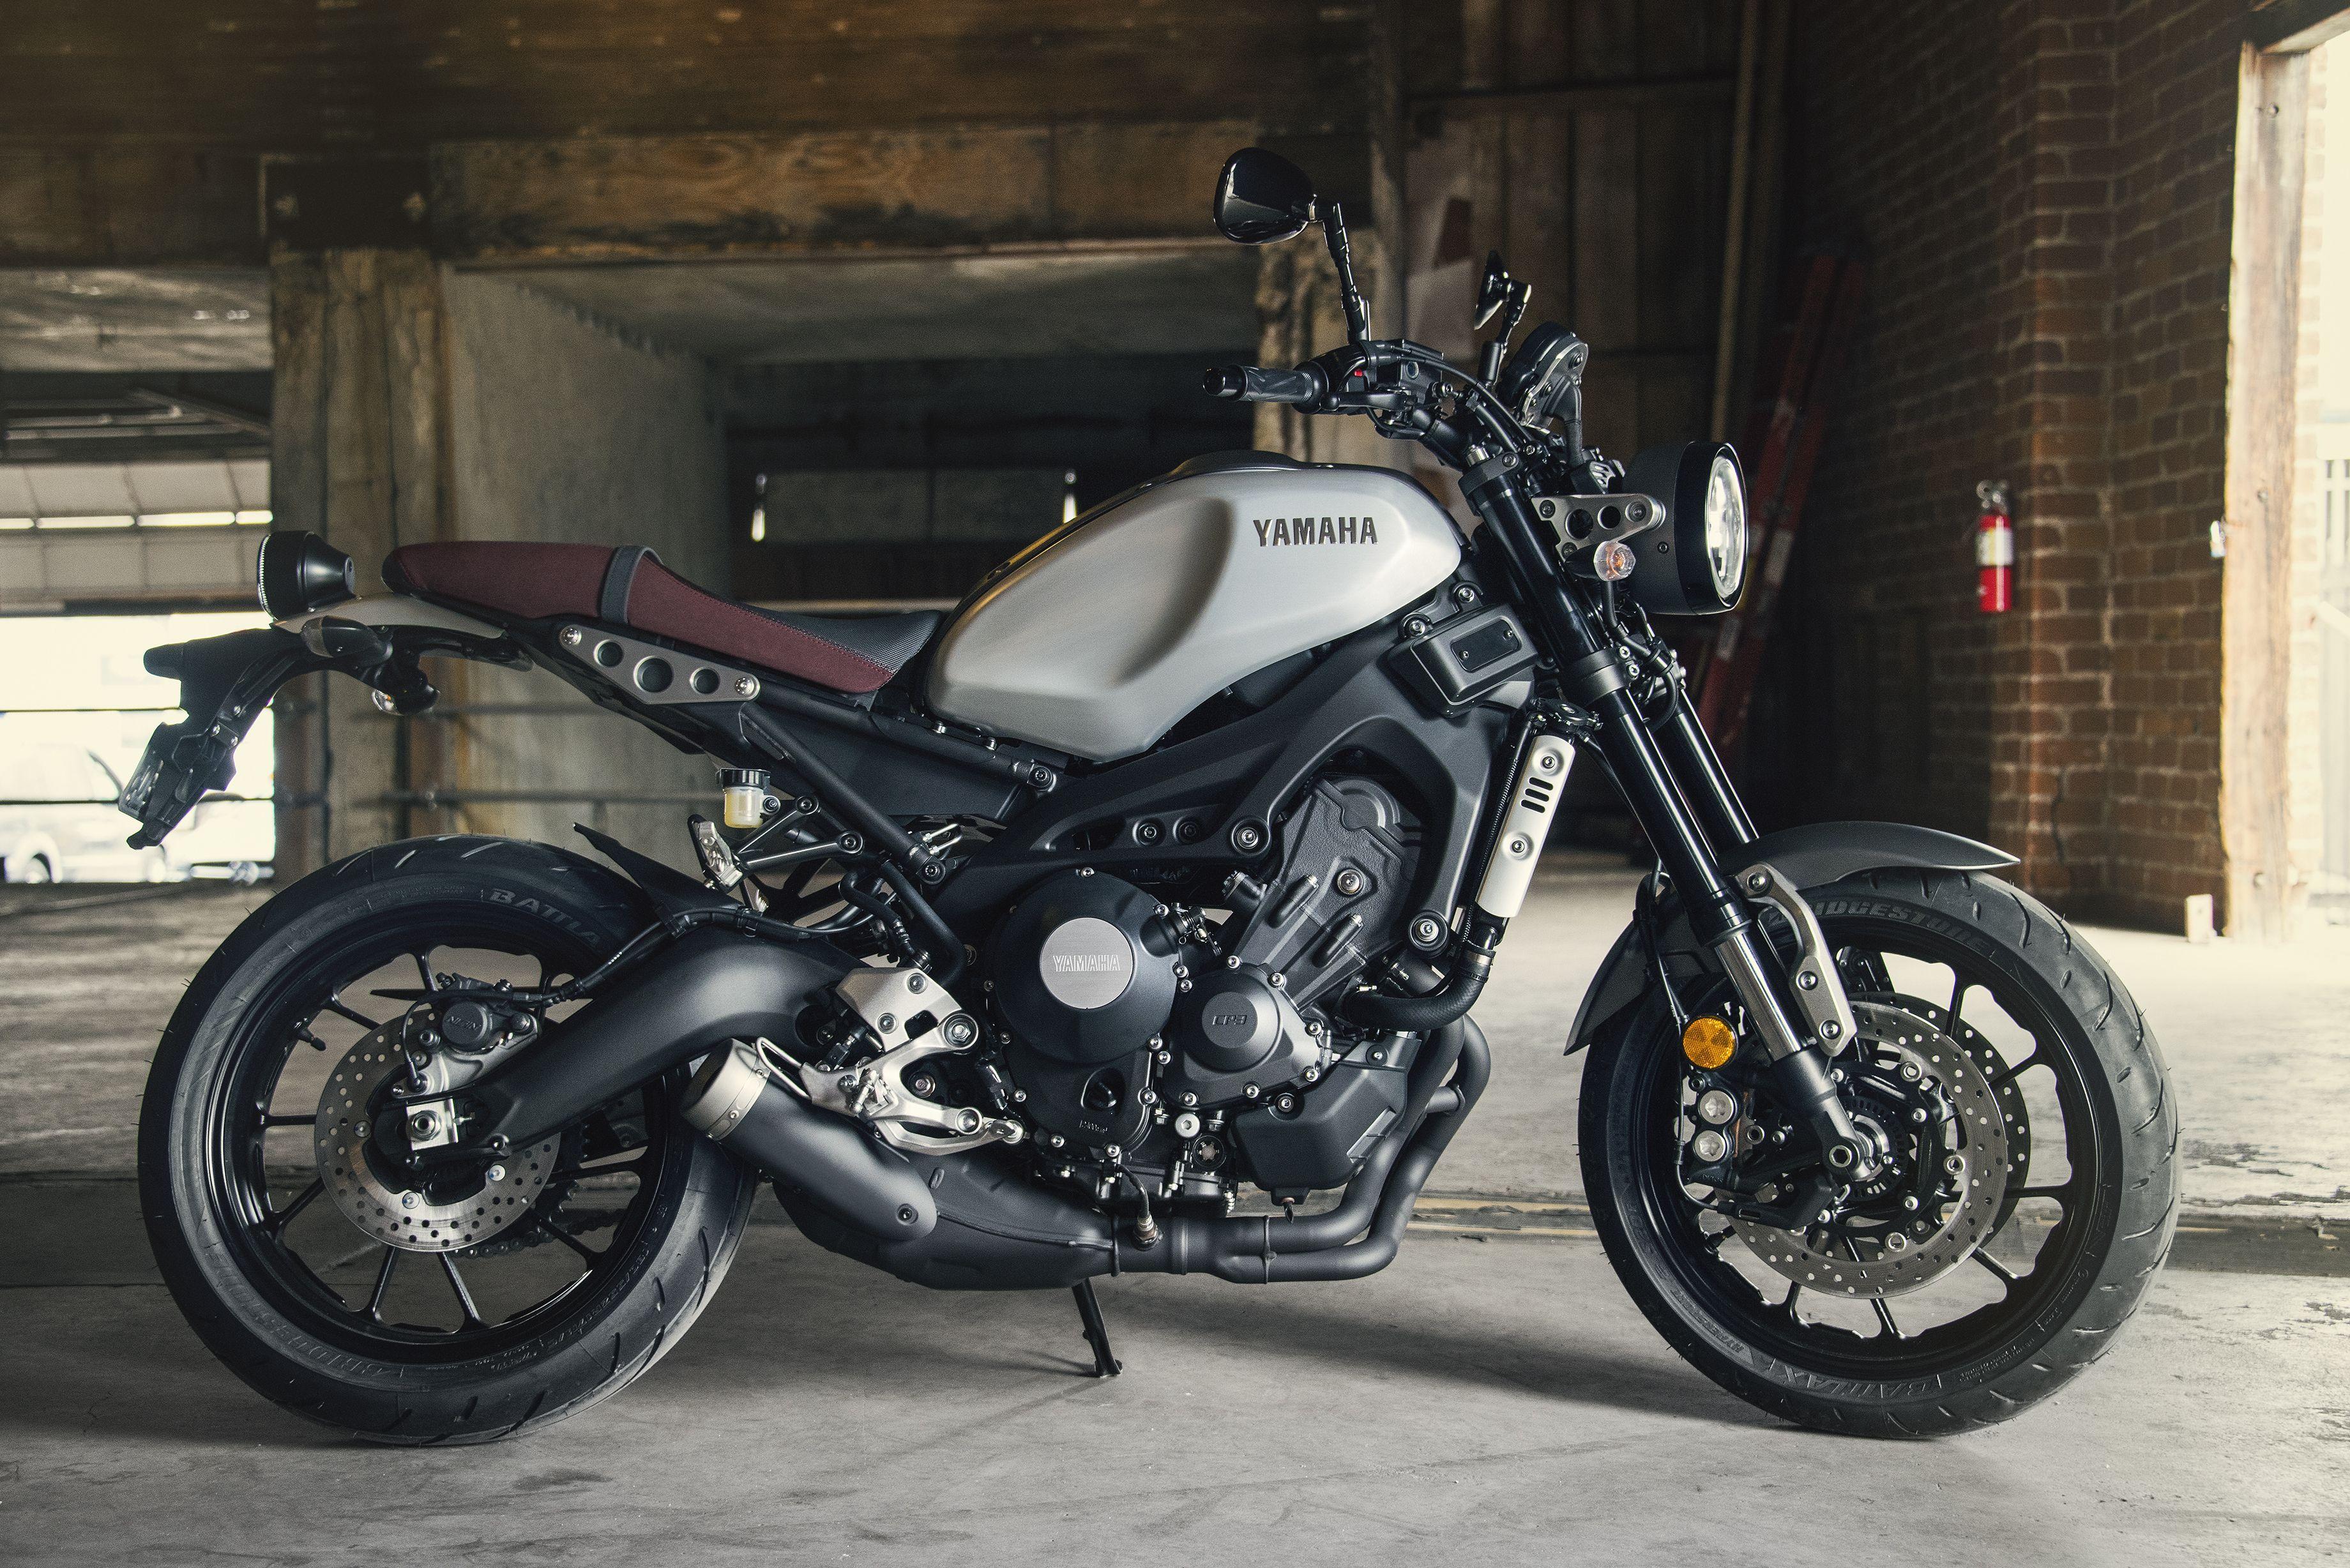 2016 Yamaha Xsr900 The Yamaha 39 S Sport Naked Just Got A